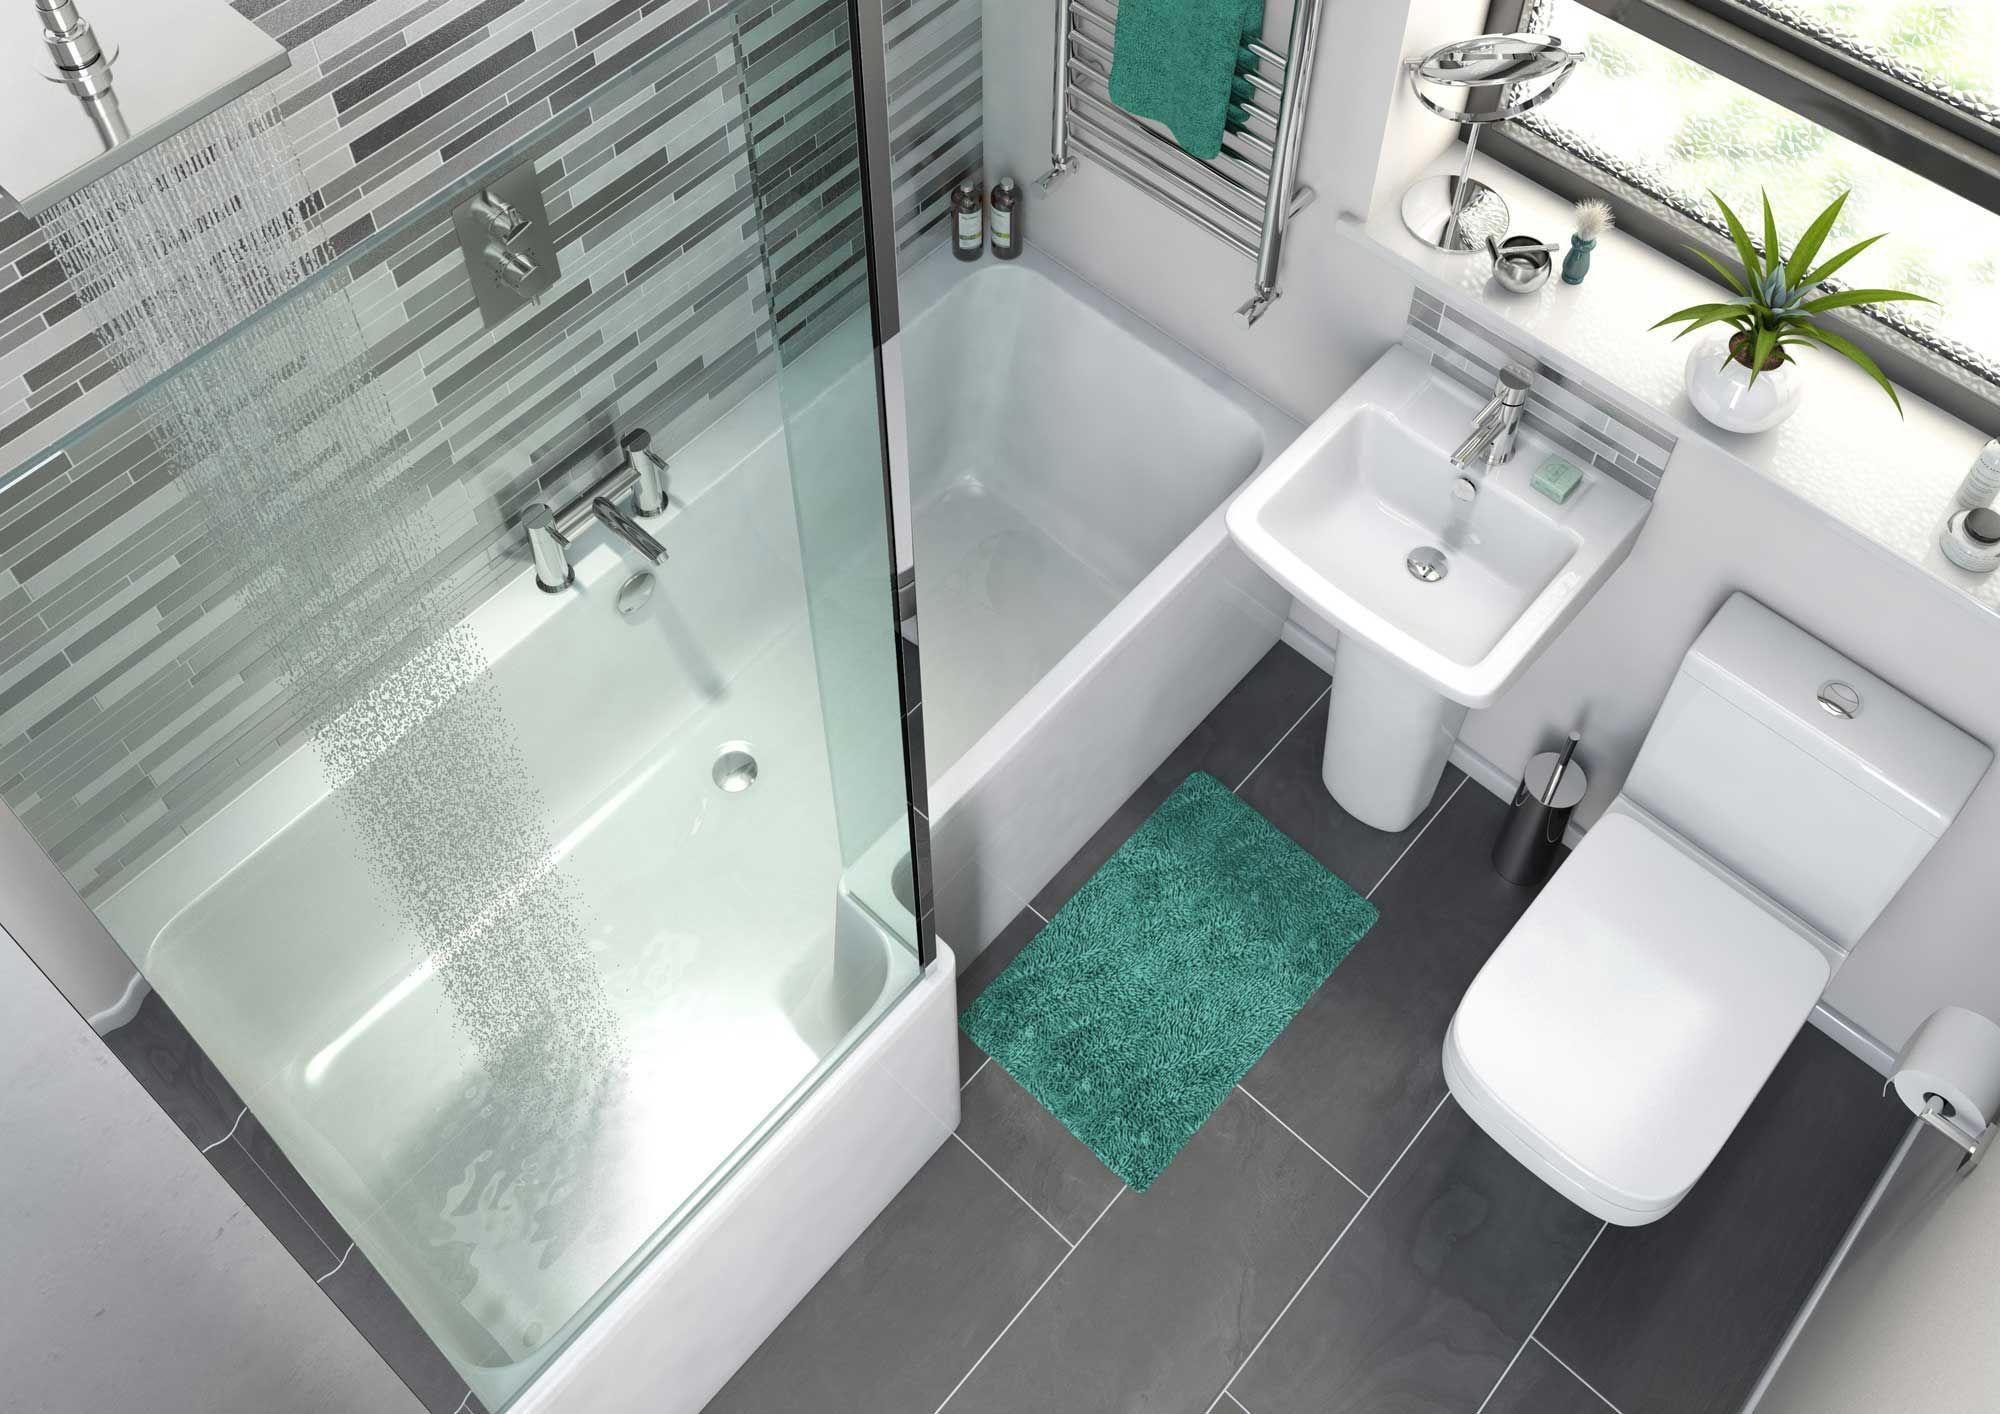 Bathroom Small Bathroom Suites Simple Ideas For Spaces Photo Gallery Throughout Incredible Suite Bathroom Small Bathroom Suites Small Bathroom Elegant Bathroom